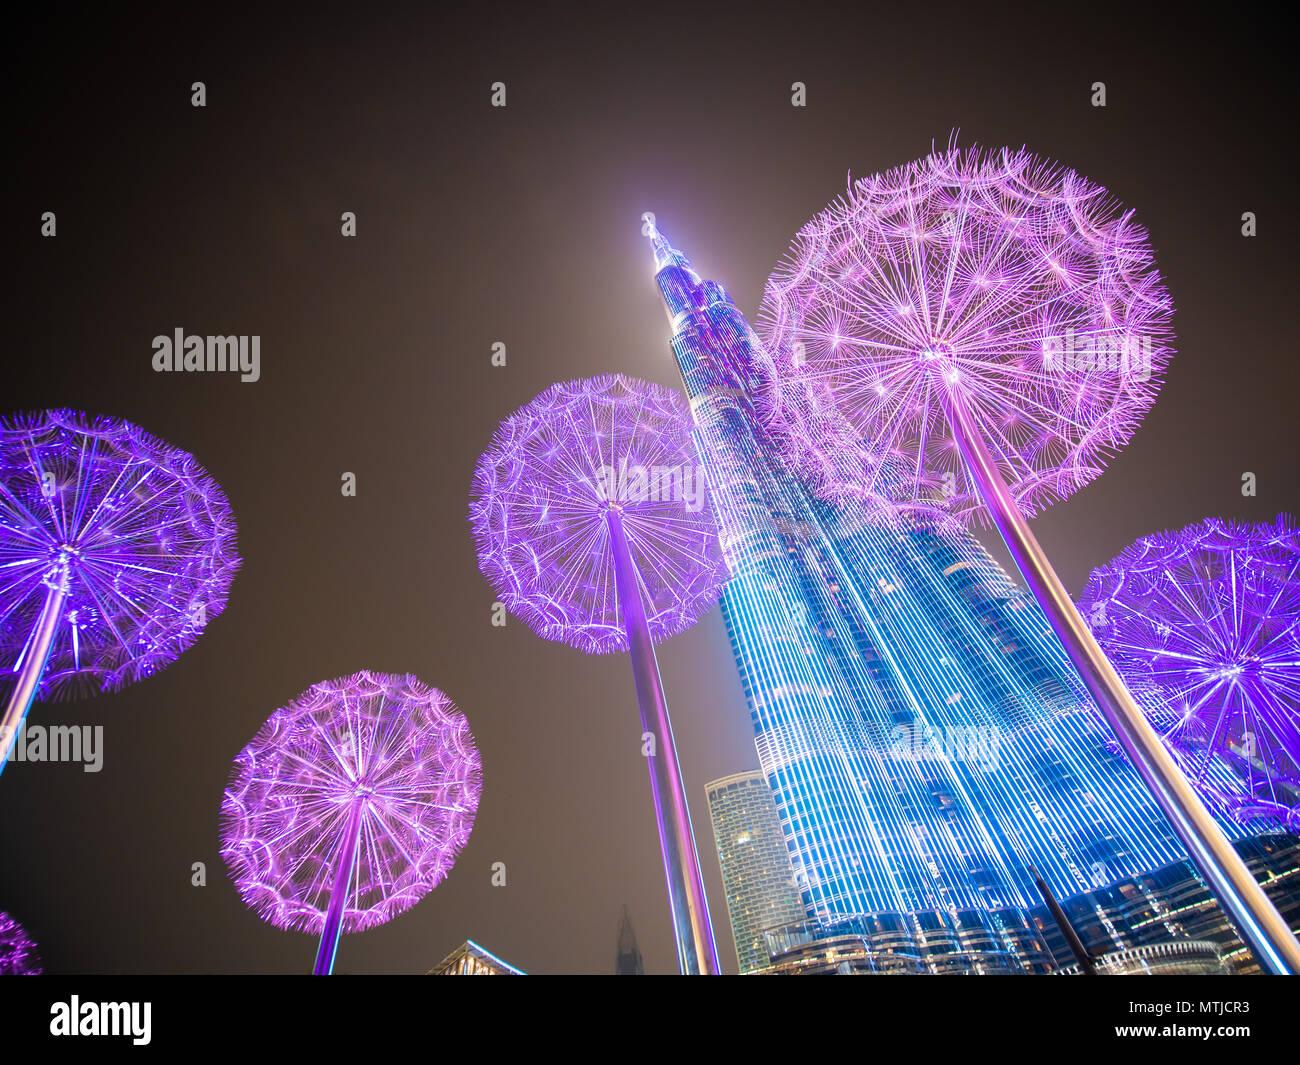 Dubai, UAE - May 15, 2018: Burj Khalifa in the late evening against the background of luminous dandelions. - Stock Image